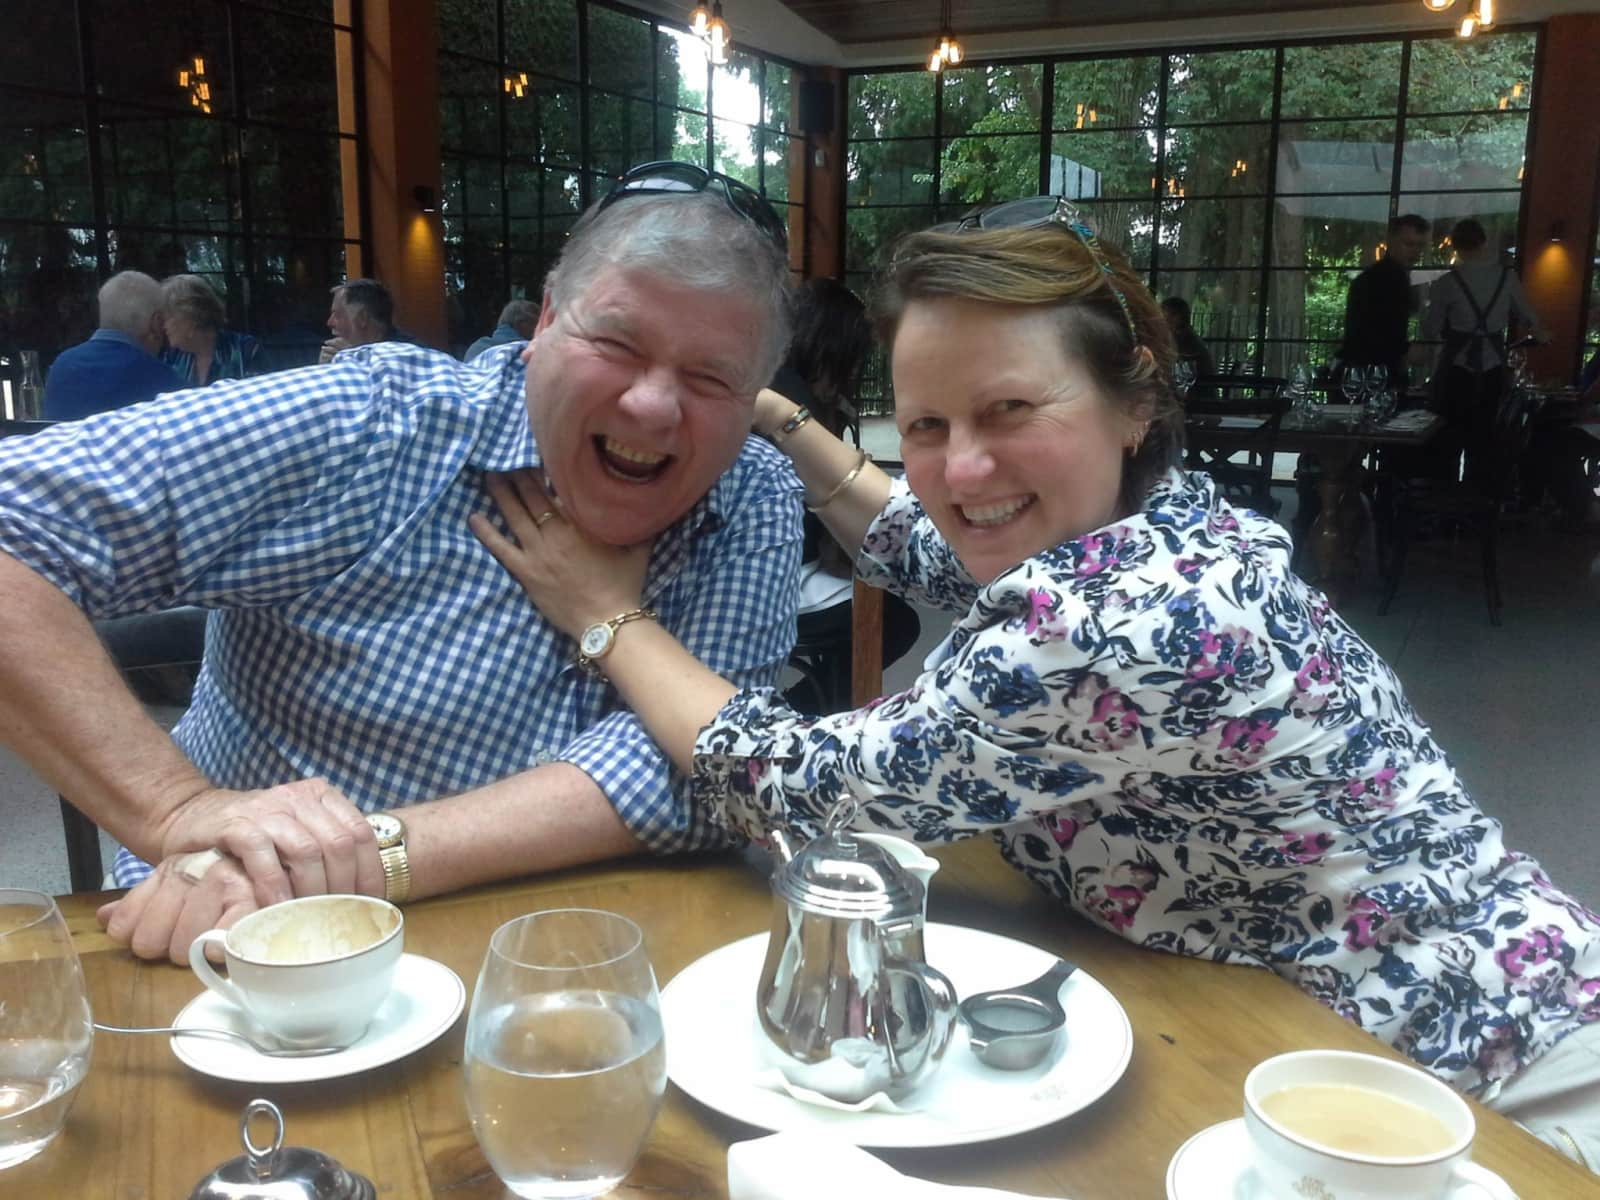 Ralph & Coralie from Bunbury, Western Australia, Australia